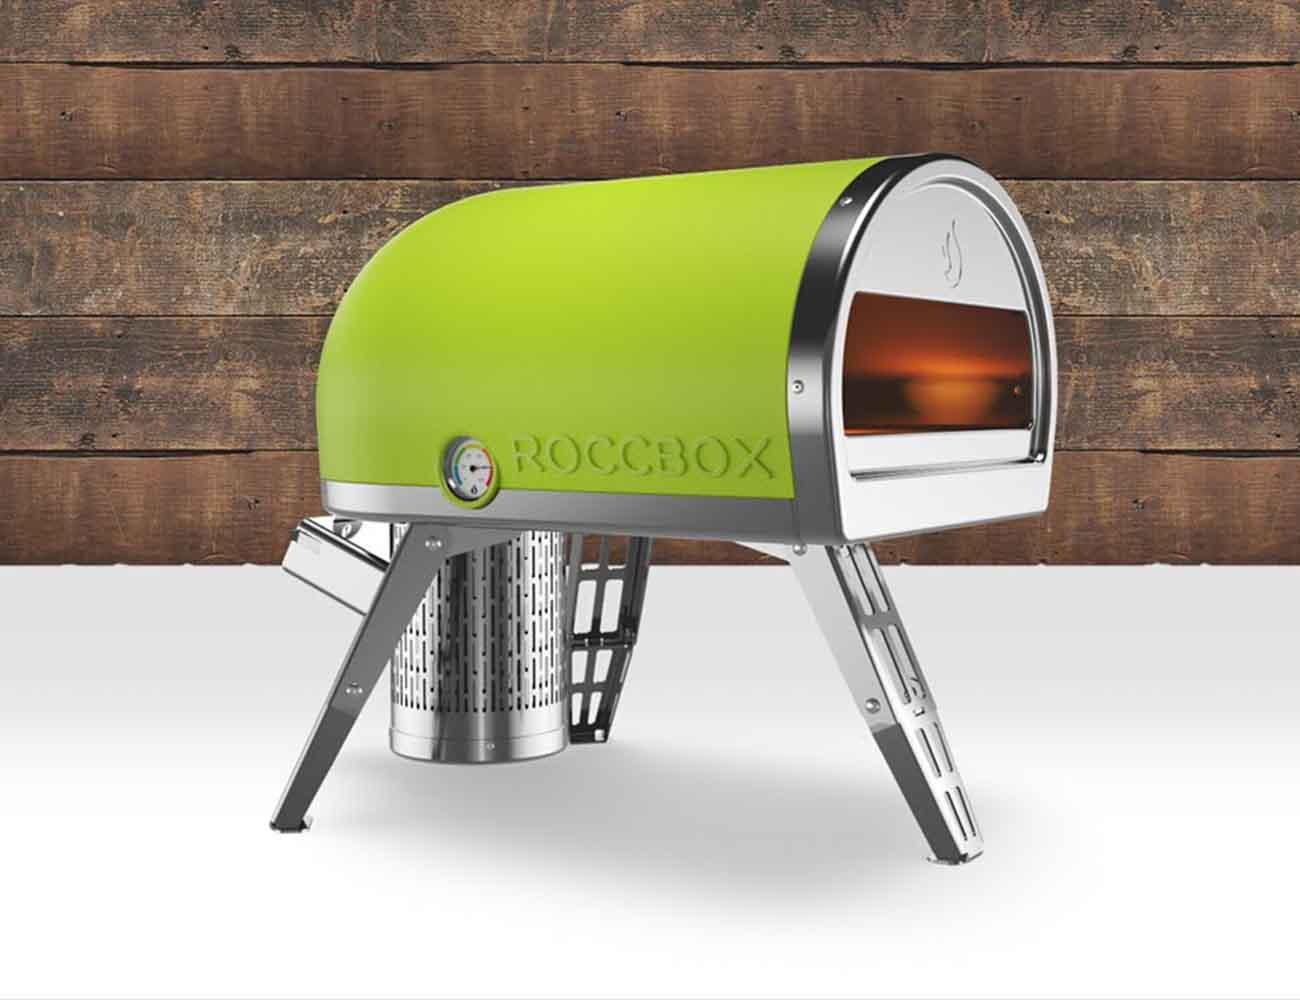 Roccbox – The Portable Stone Bake Pizza Oven